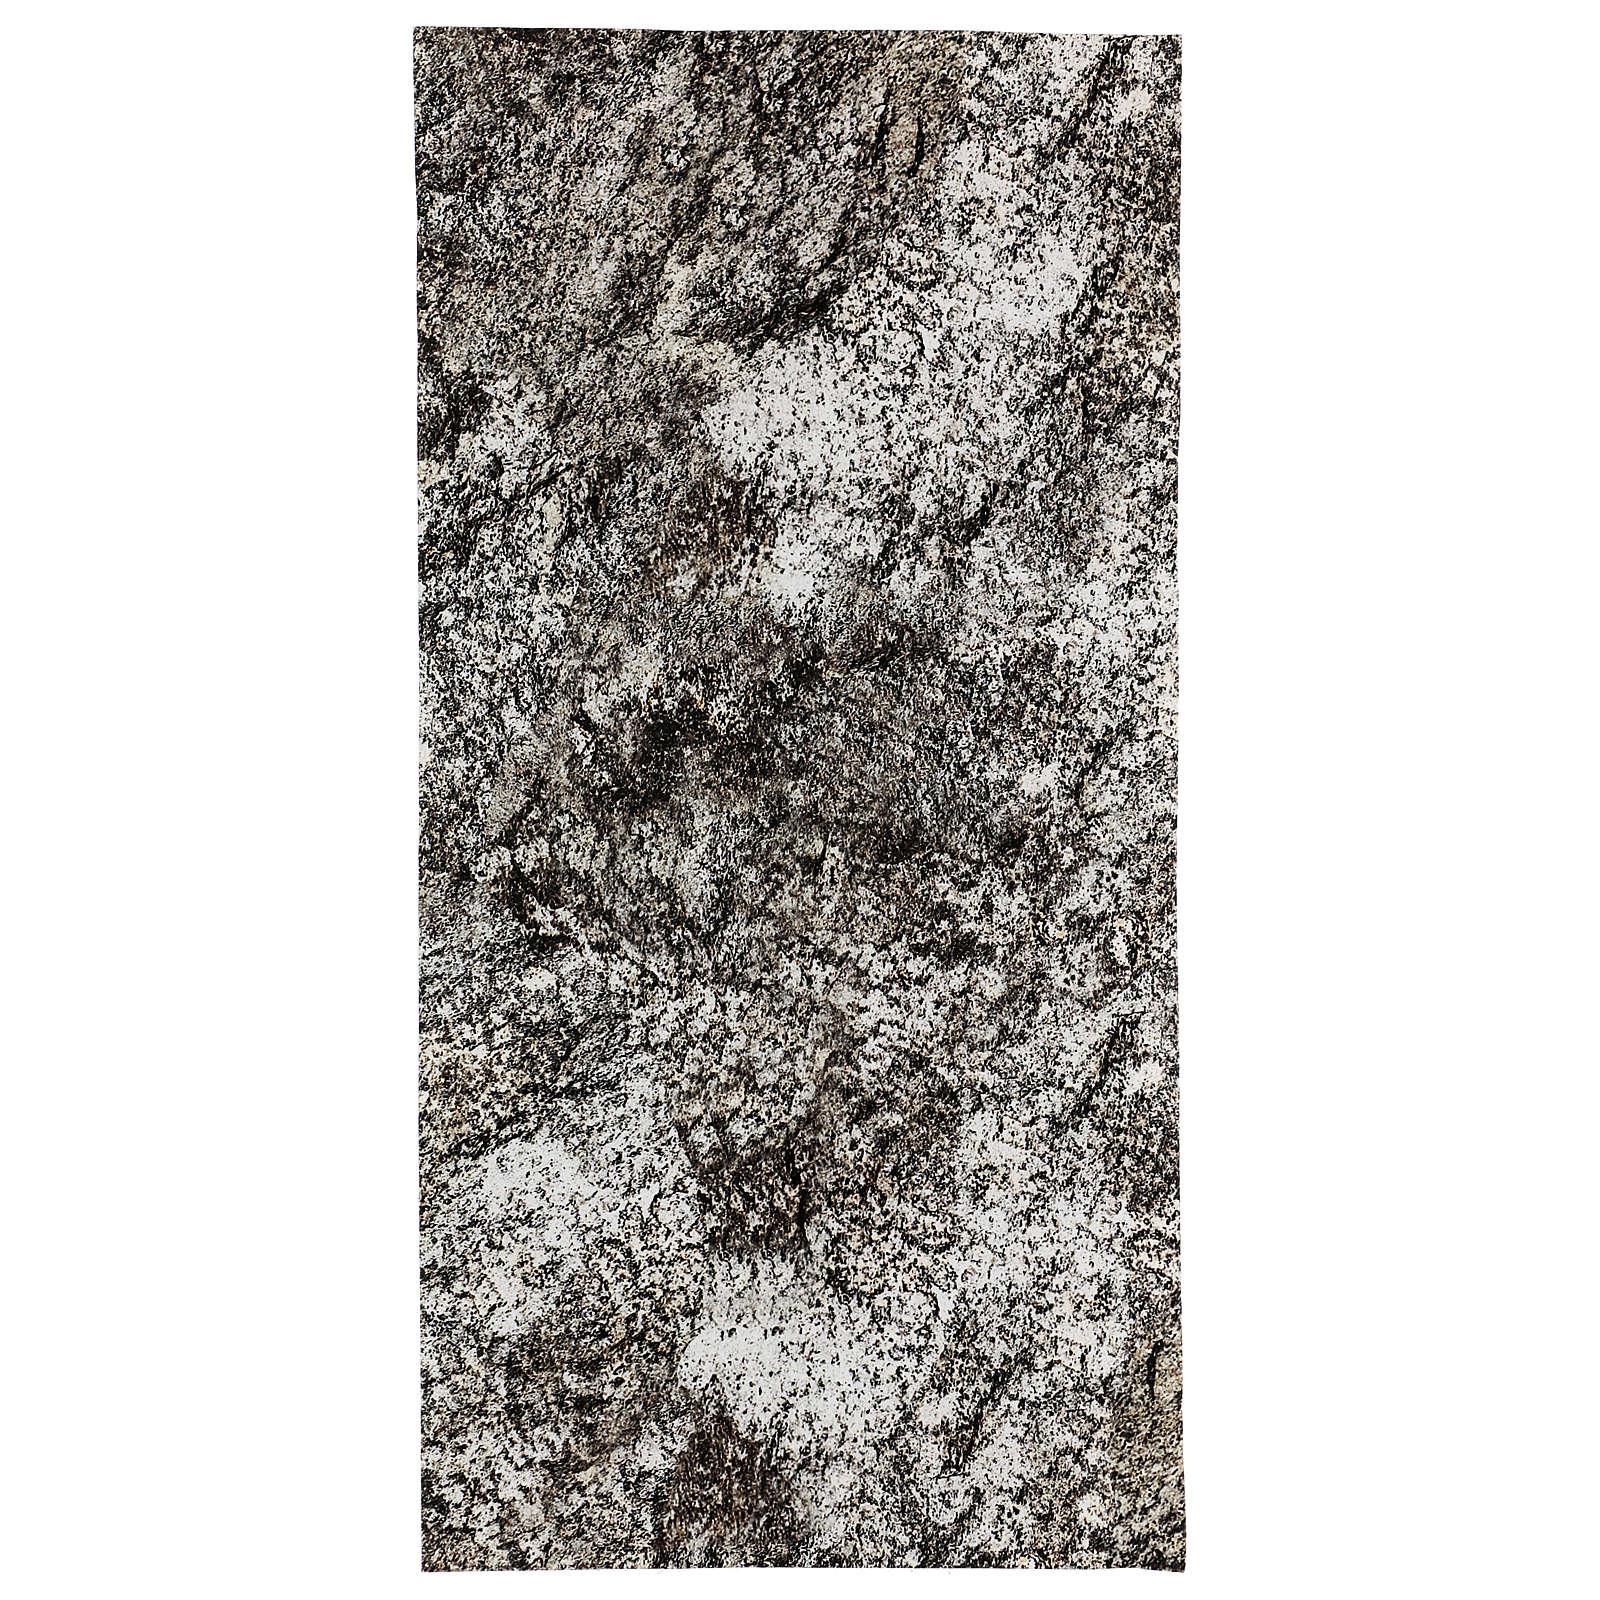 Nativity scene background paper, snowy rock 60x30 cm 4